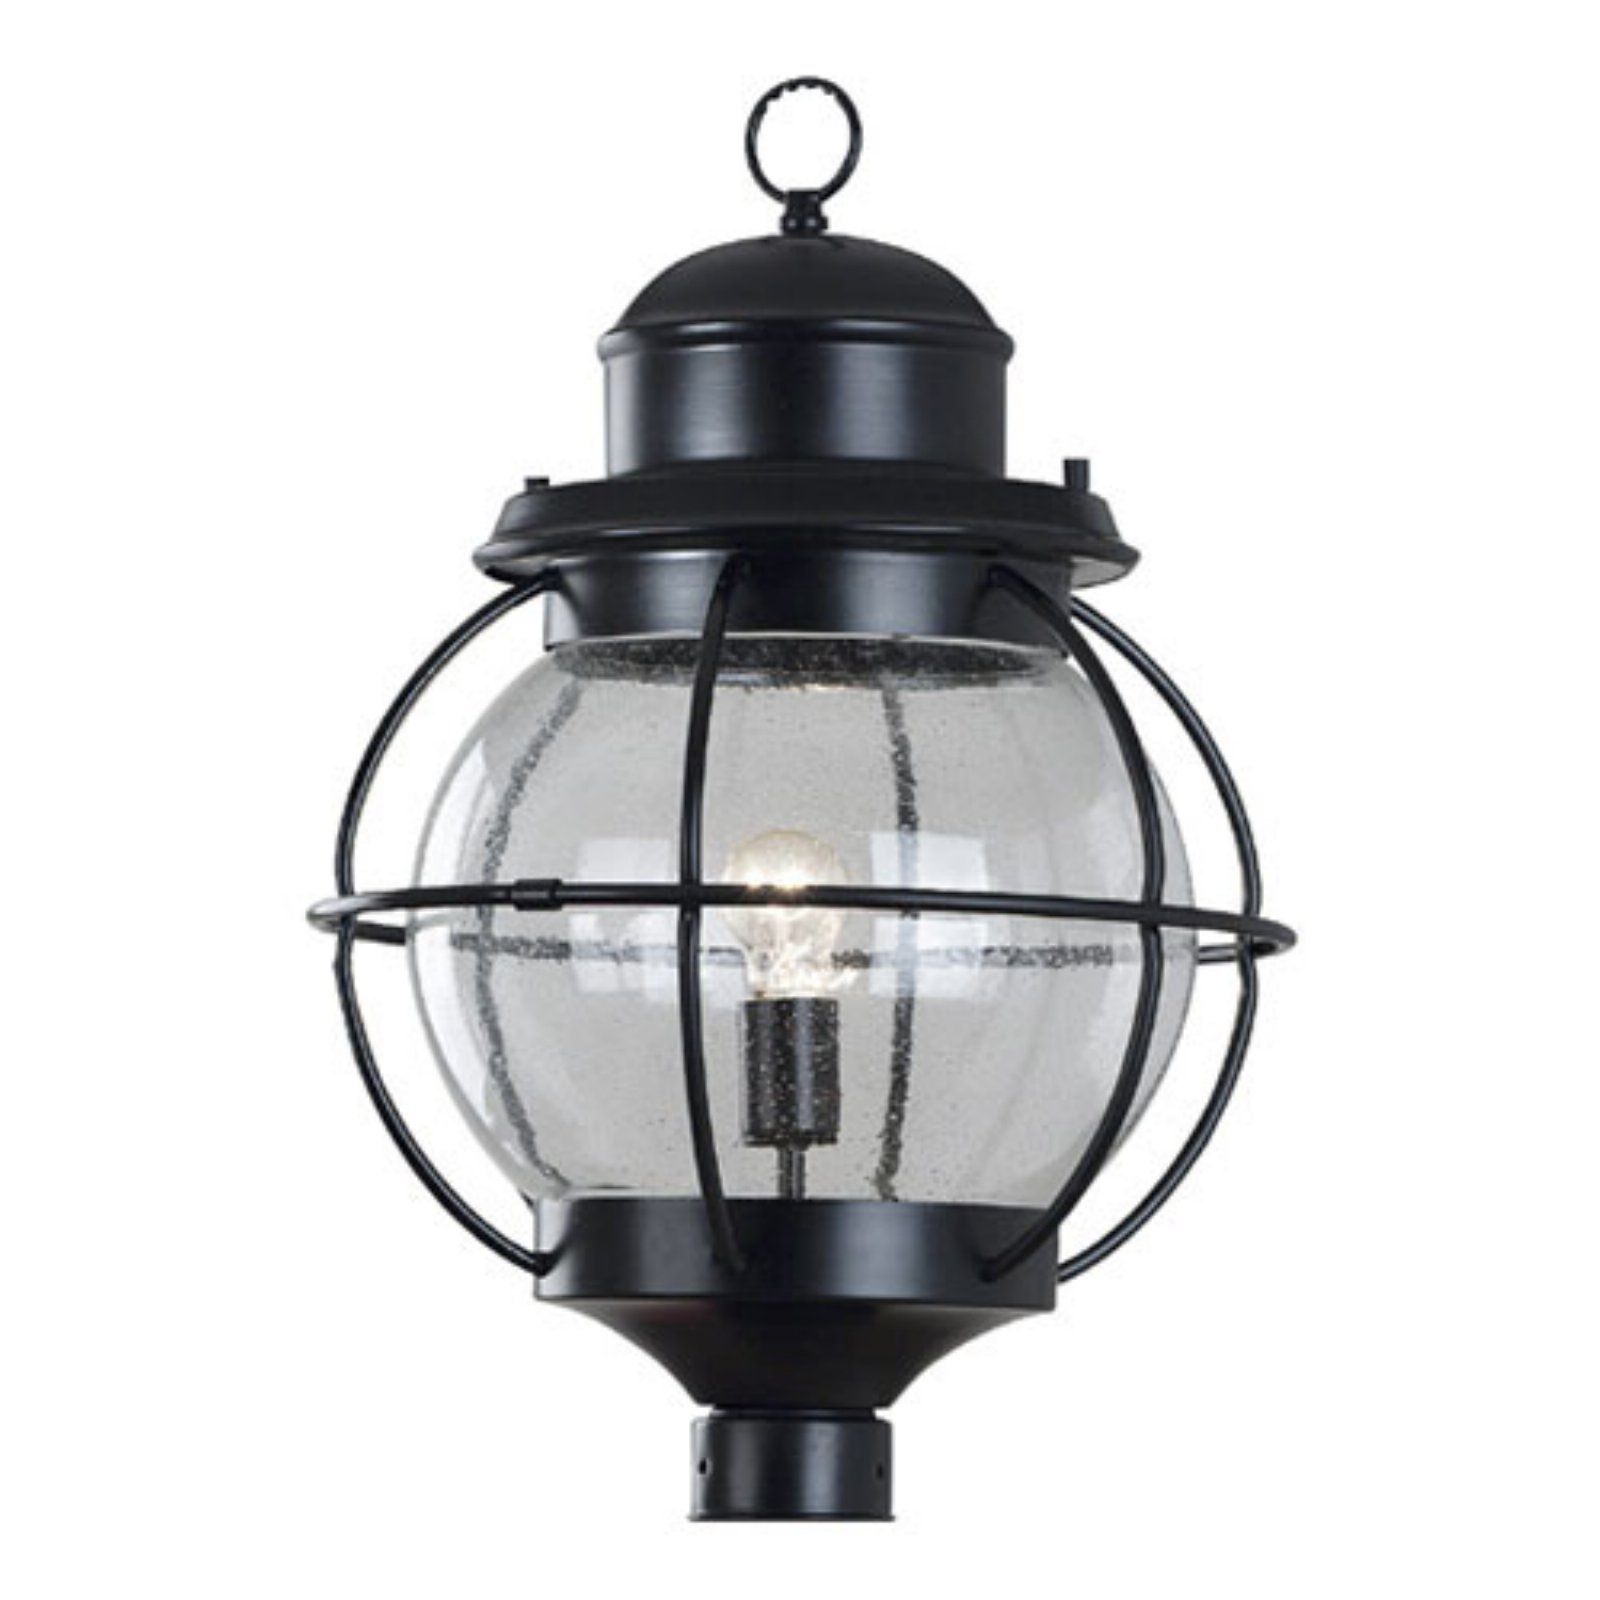 Hatteras 1 Light Post Lantern image